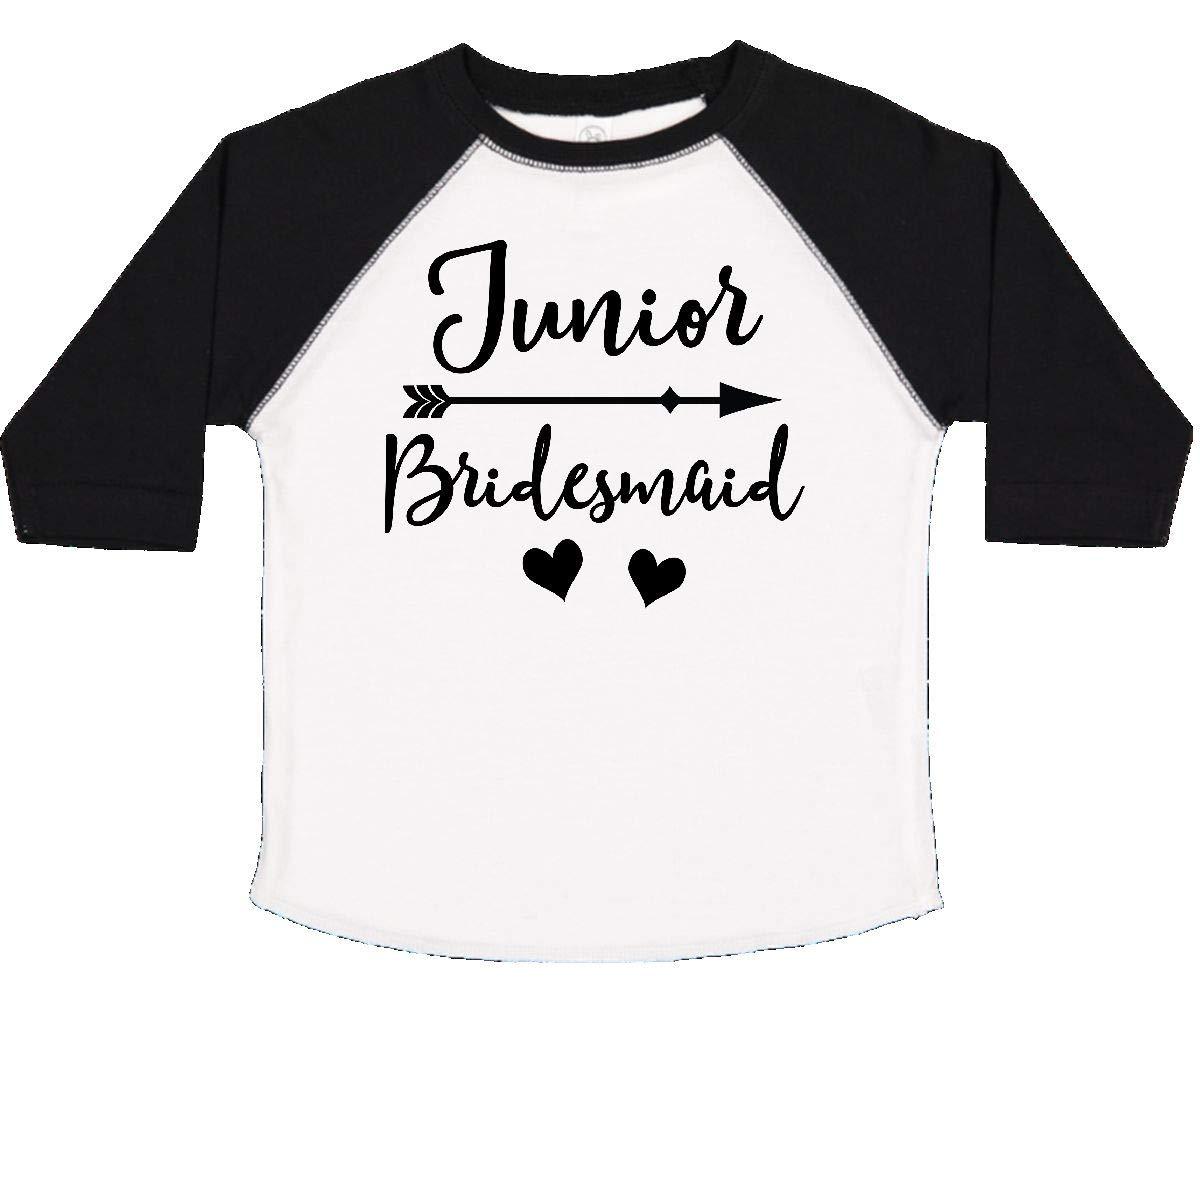 inktastic Junior Bridesmaid Wedding Bridal Party Gift Toddler T-Shirt